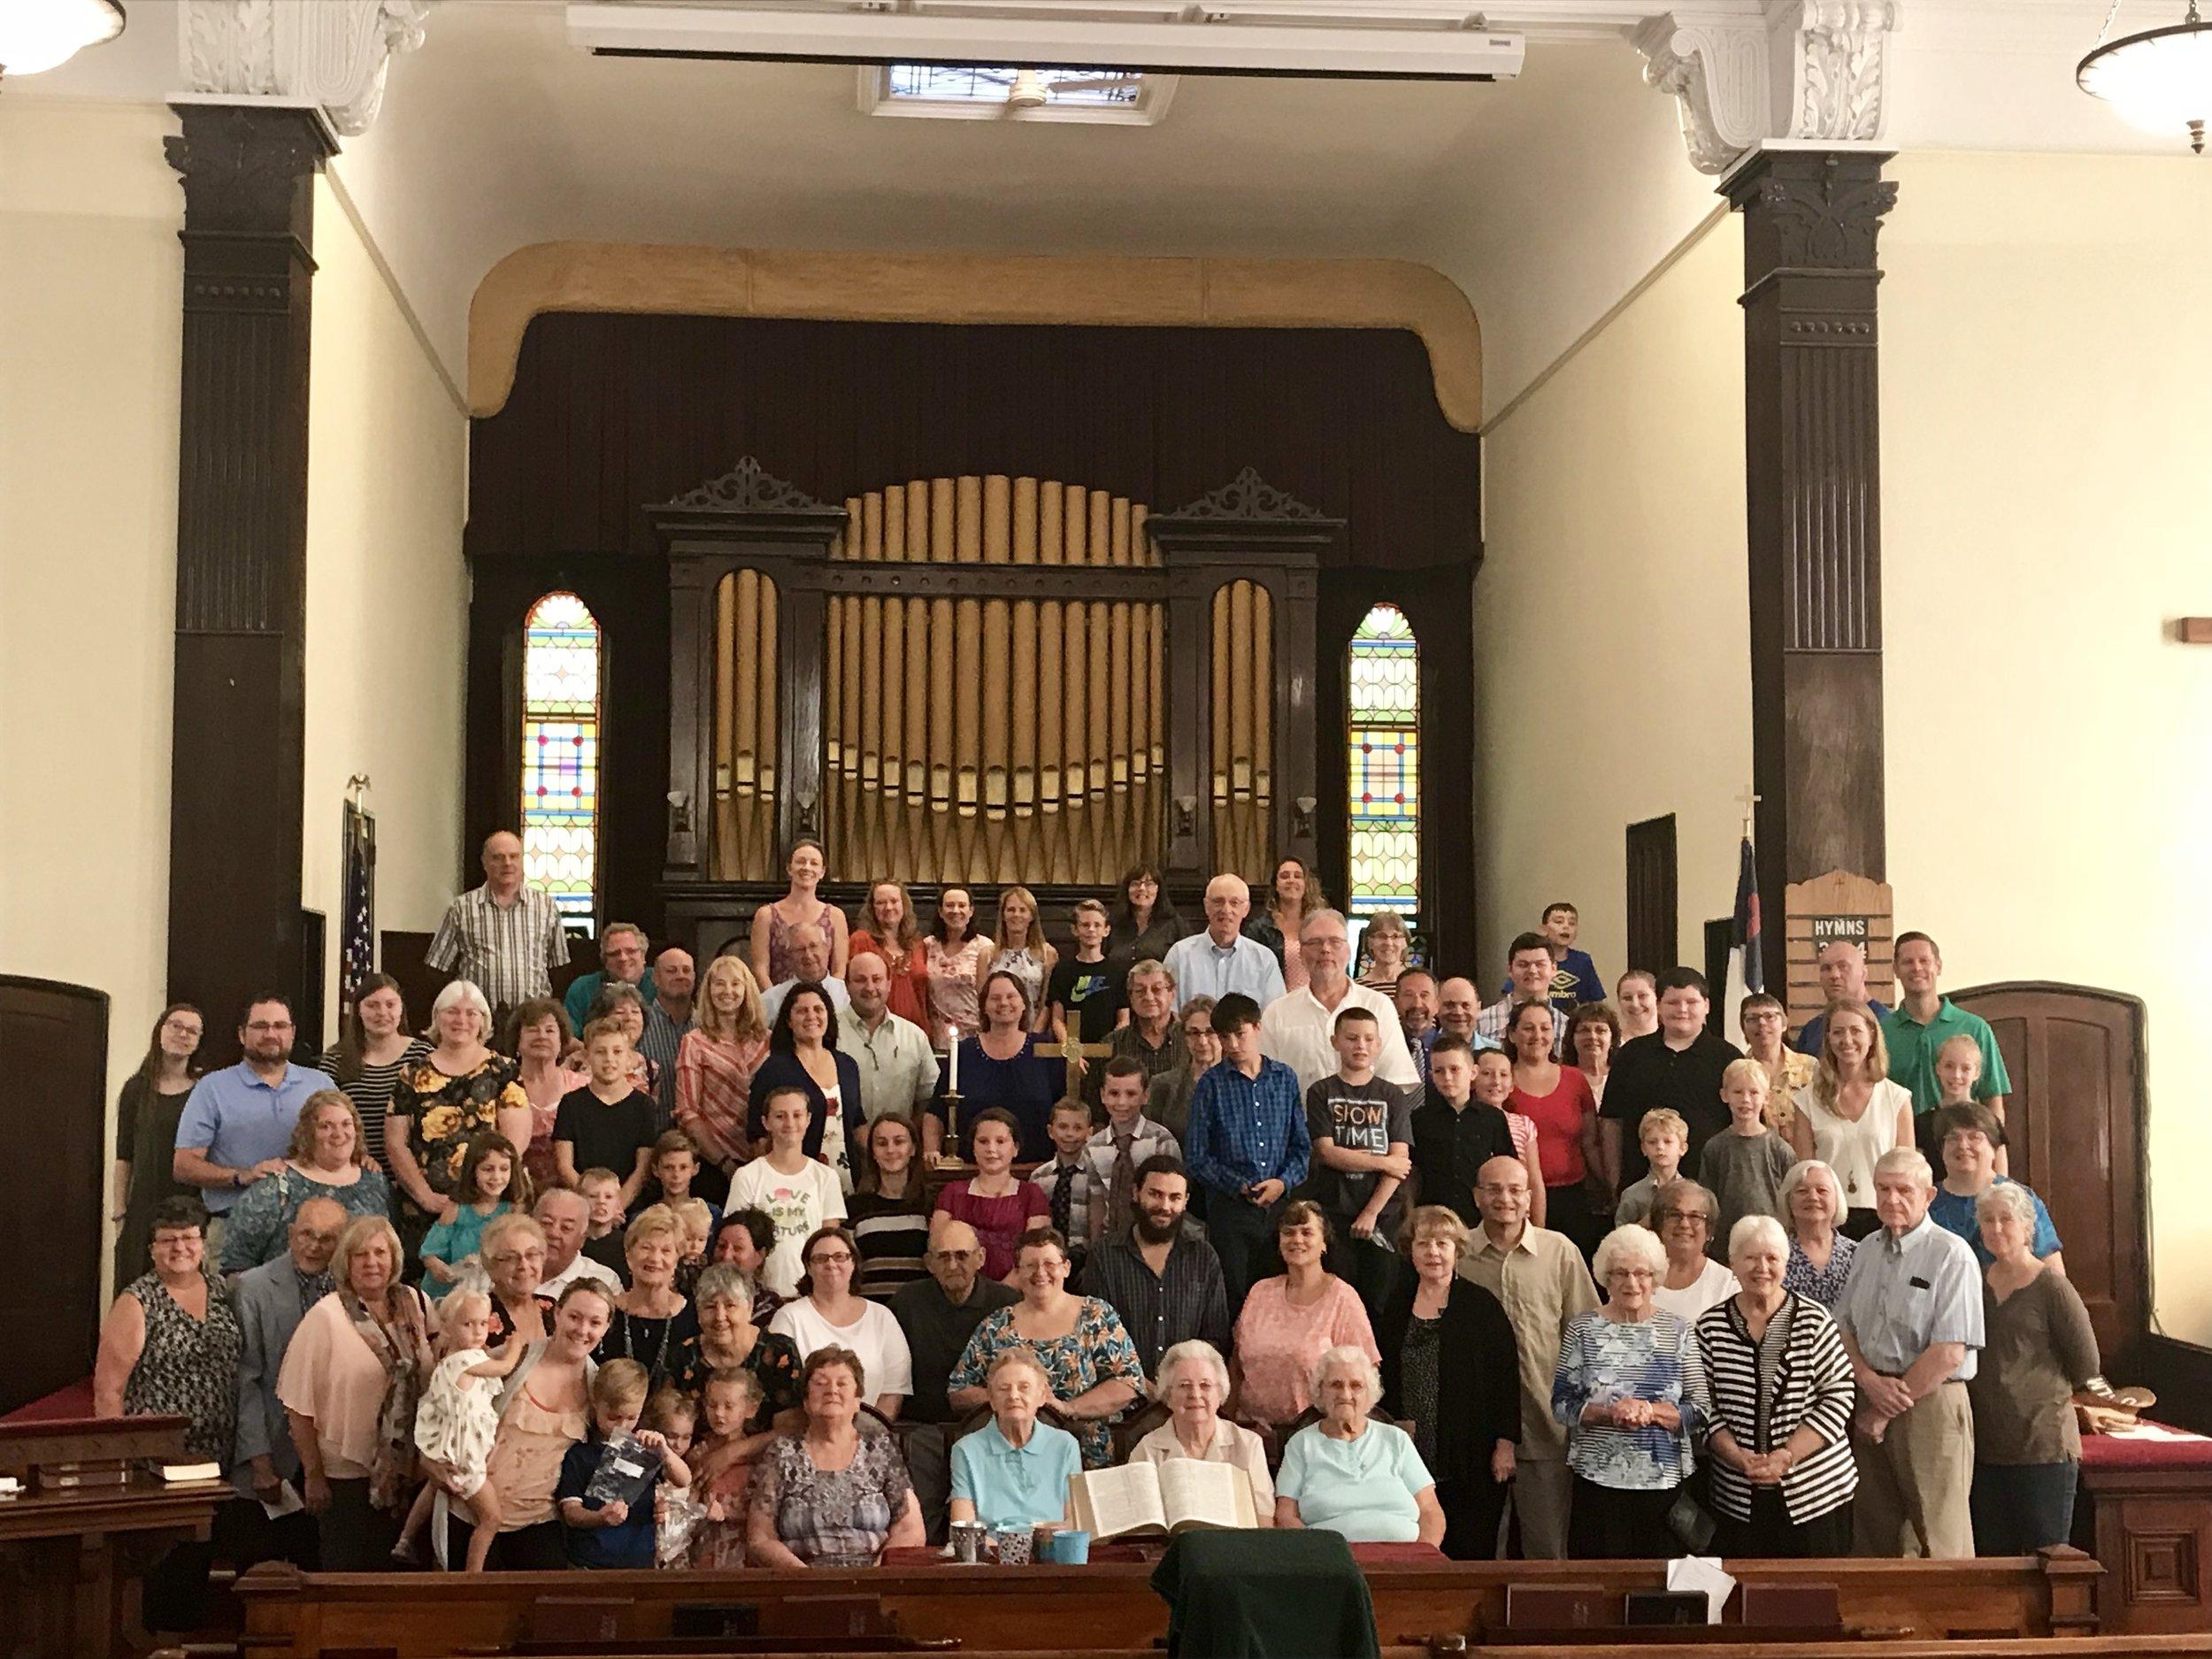 The congregation came home to Bottskill on Sunday, September 16, 2018.